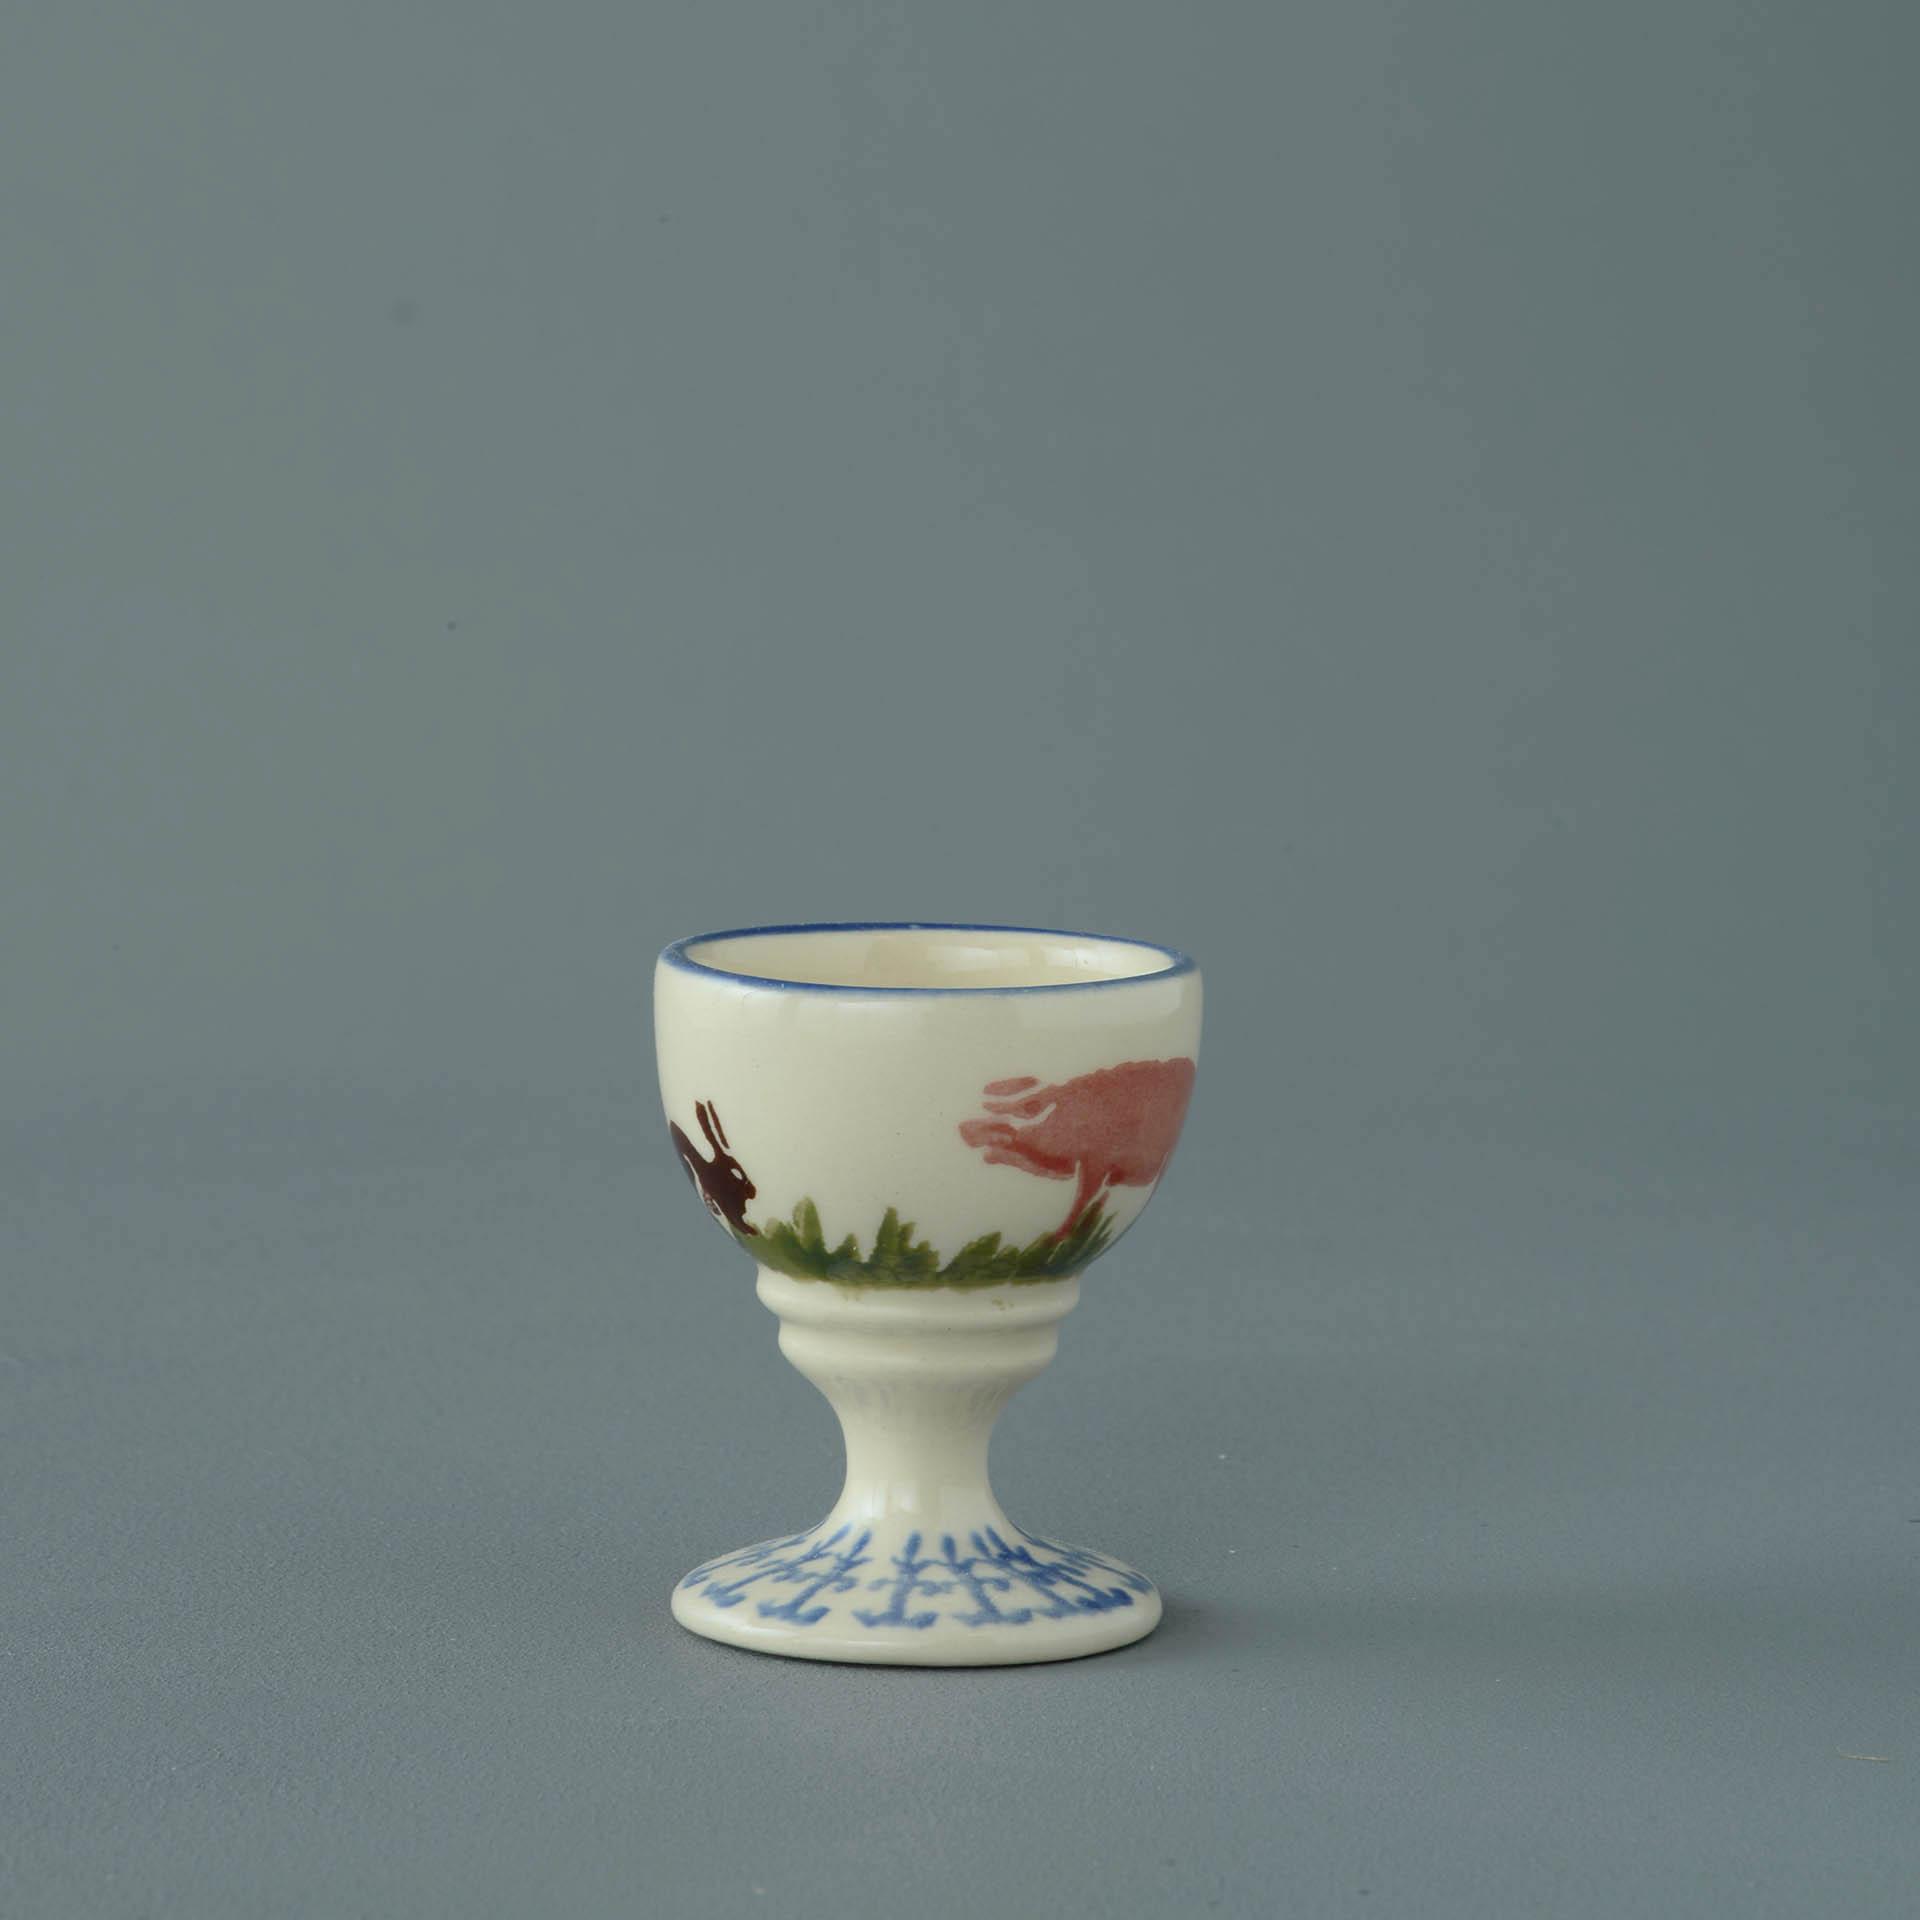 Farm Animals Egg cup 6.3 x 5.2cm